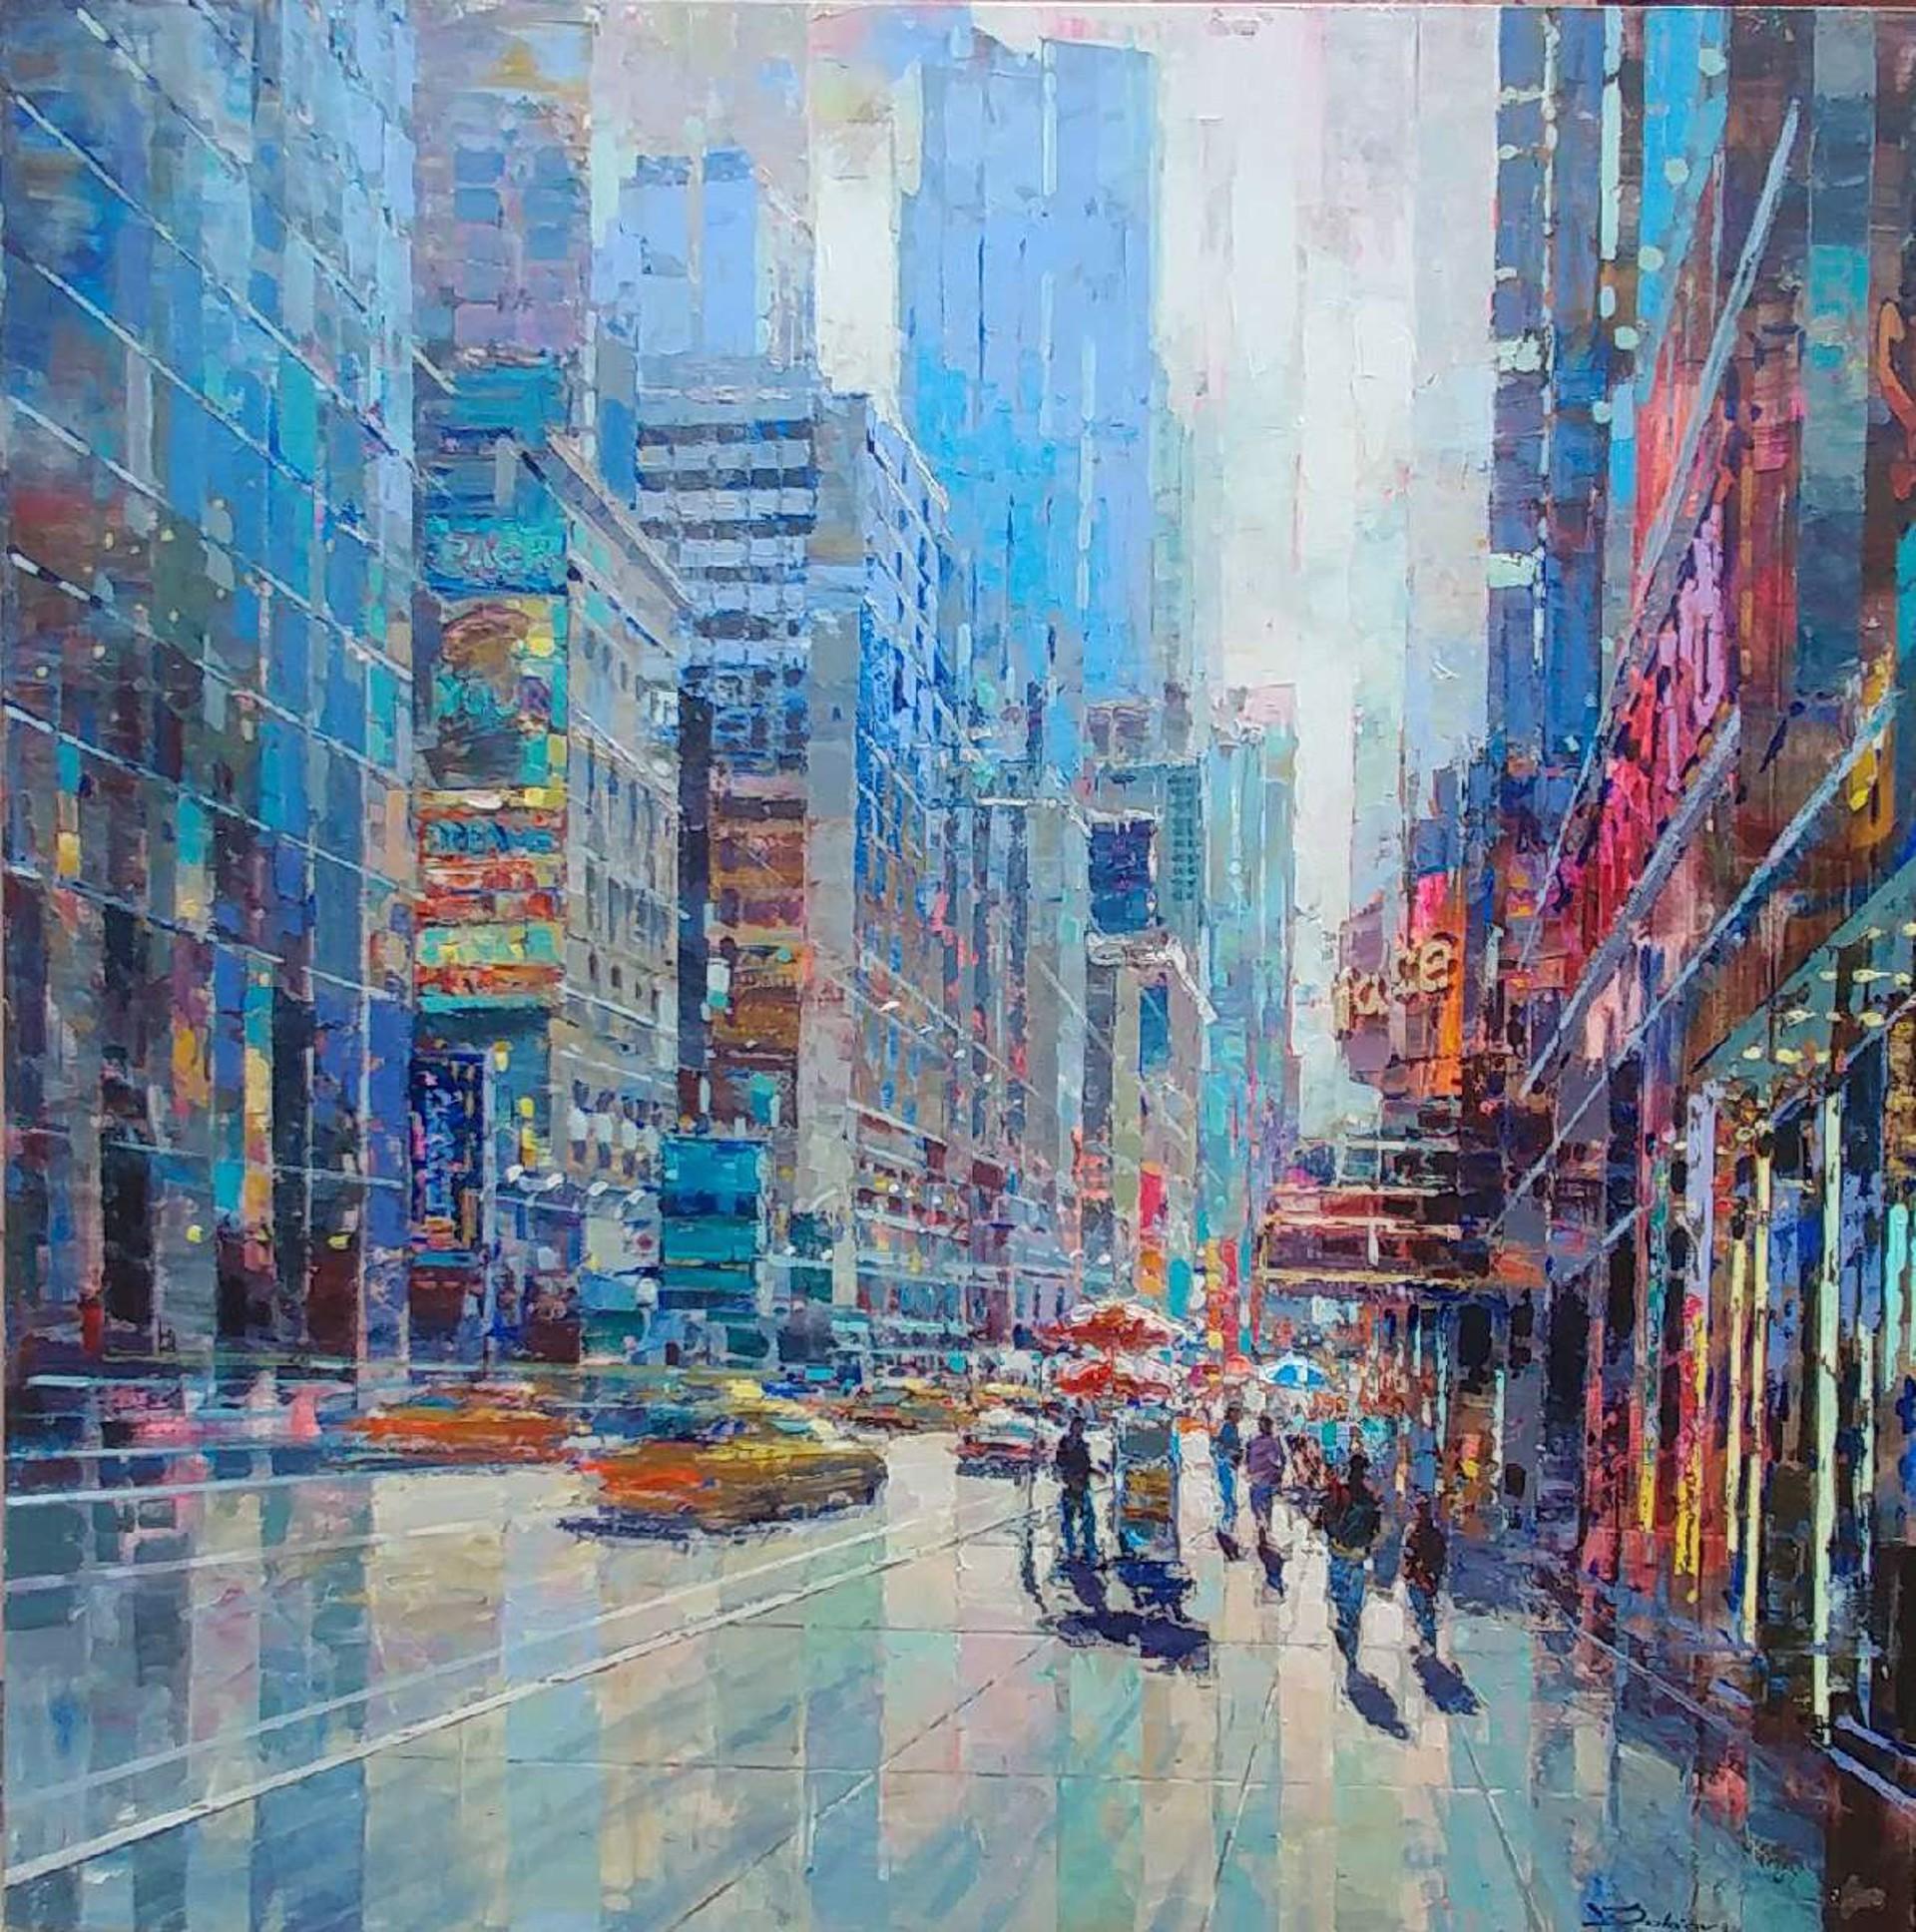 Pulse of the City by Vadim Dolgov